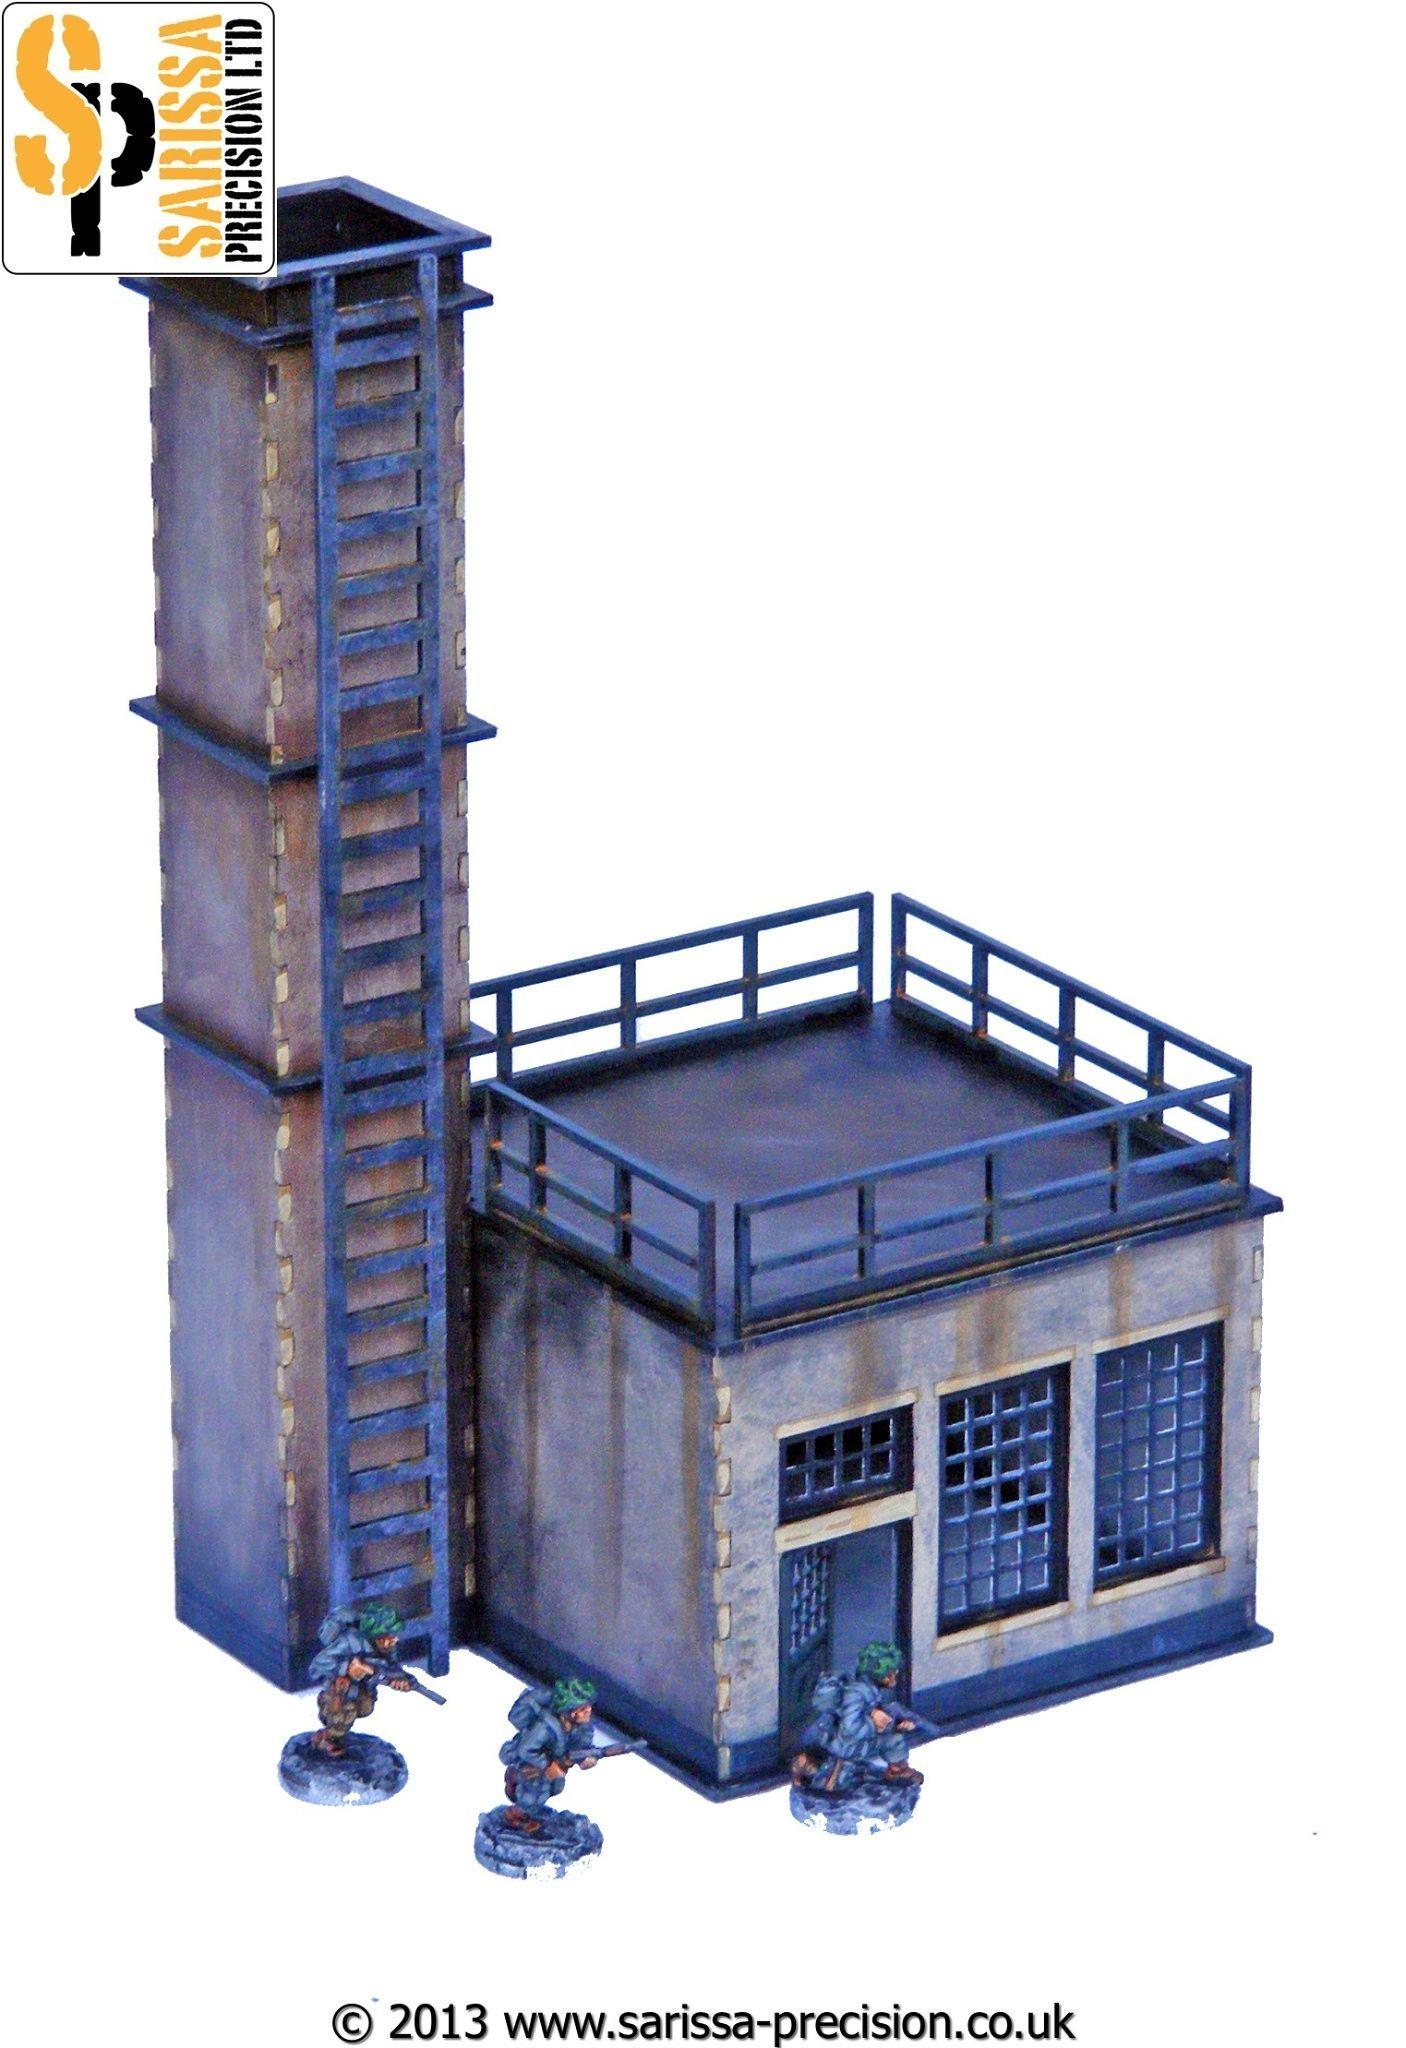 Factory - Power Room, Sarissa Precision